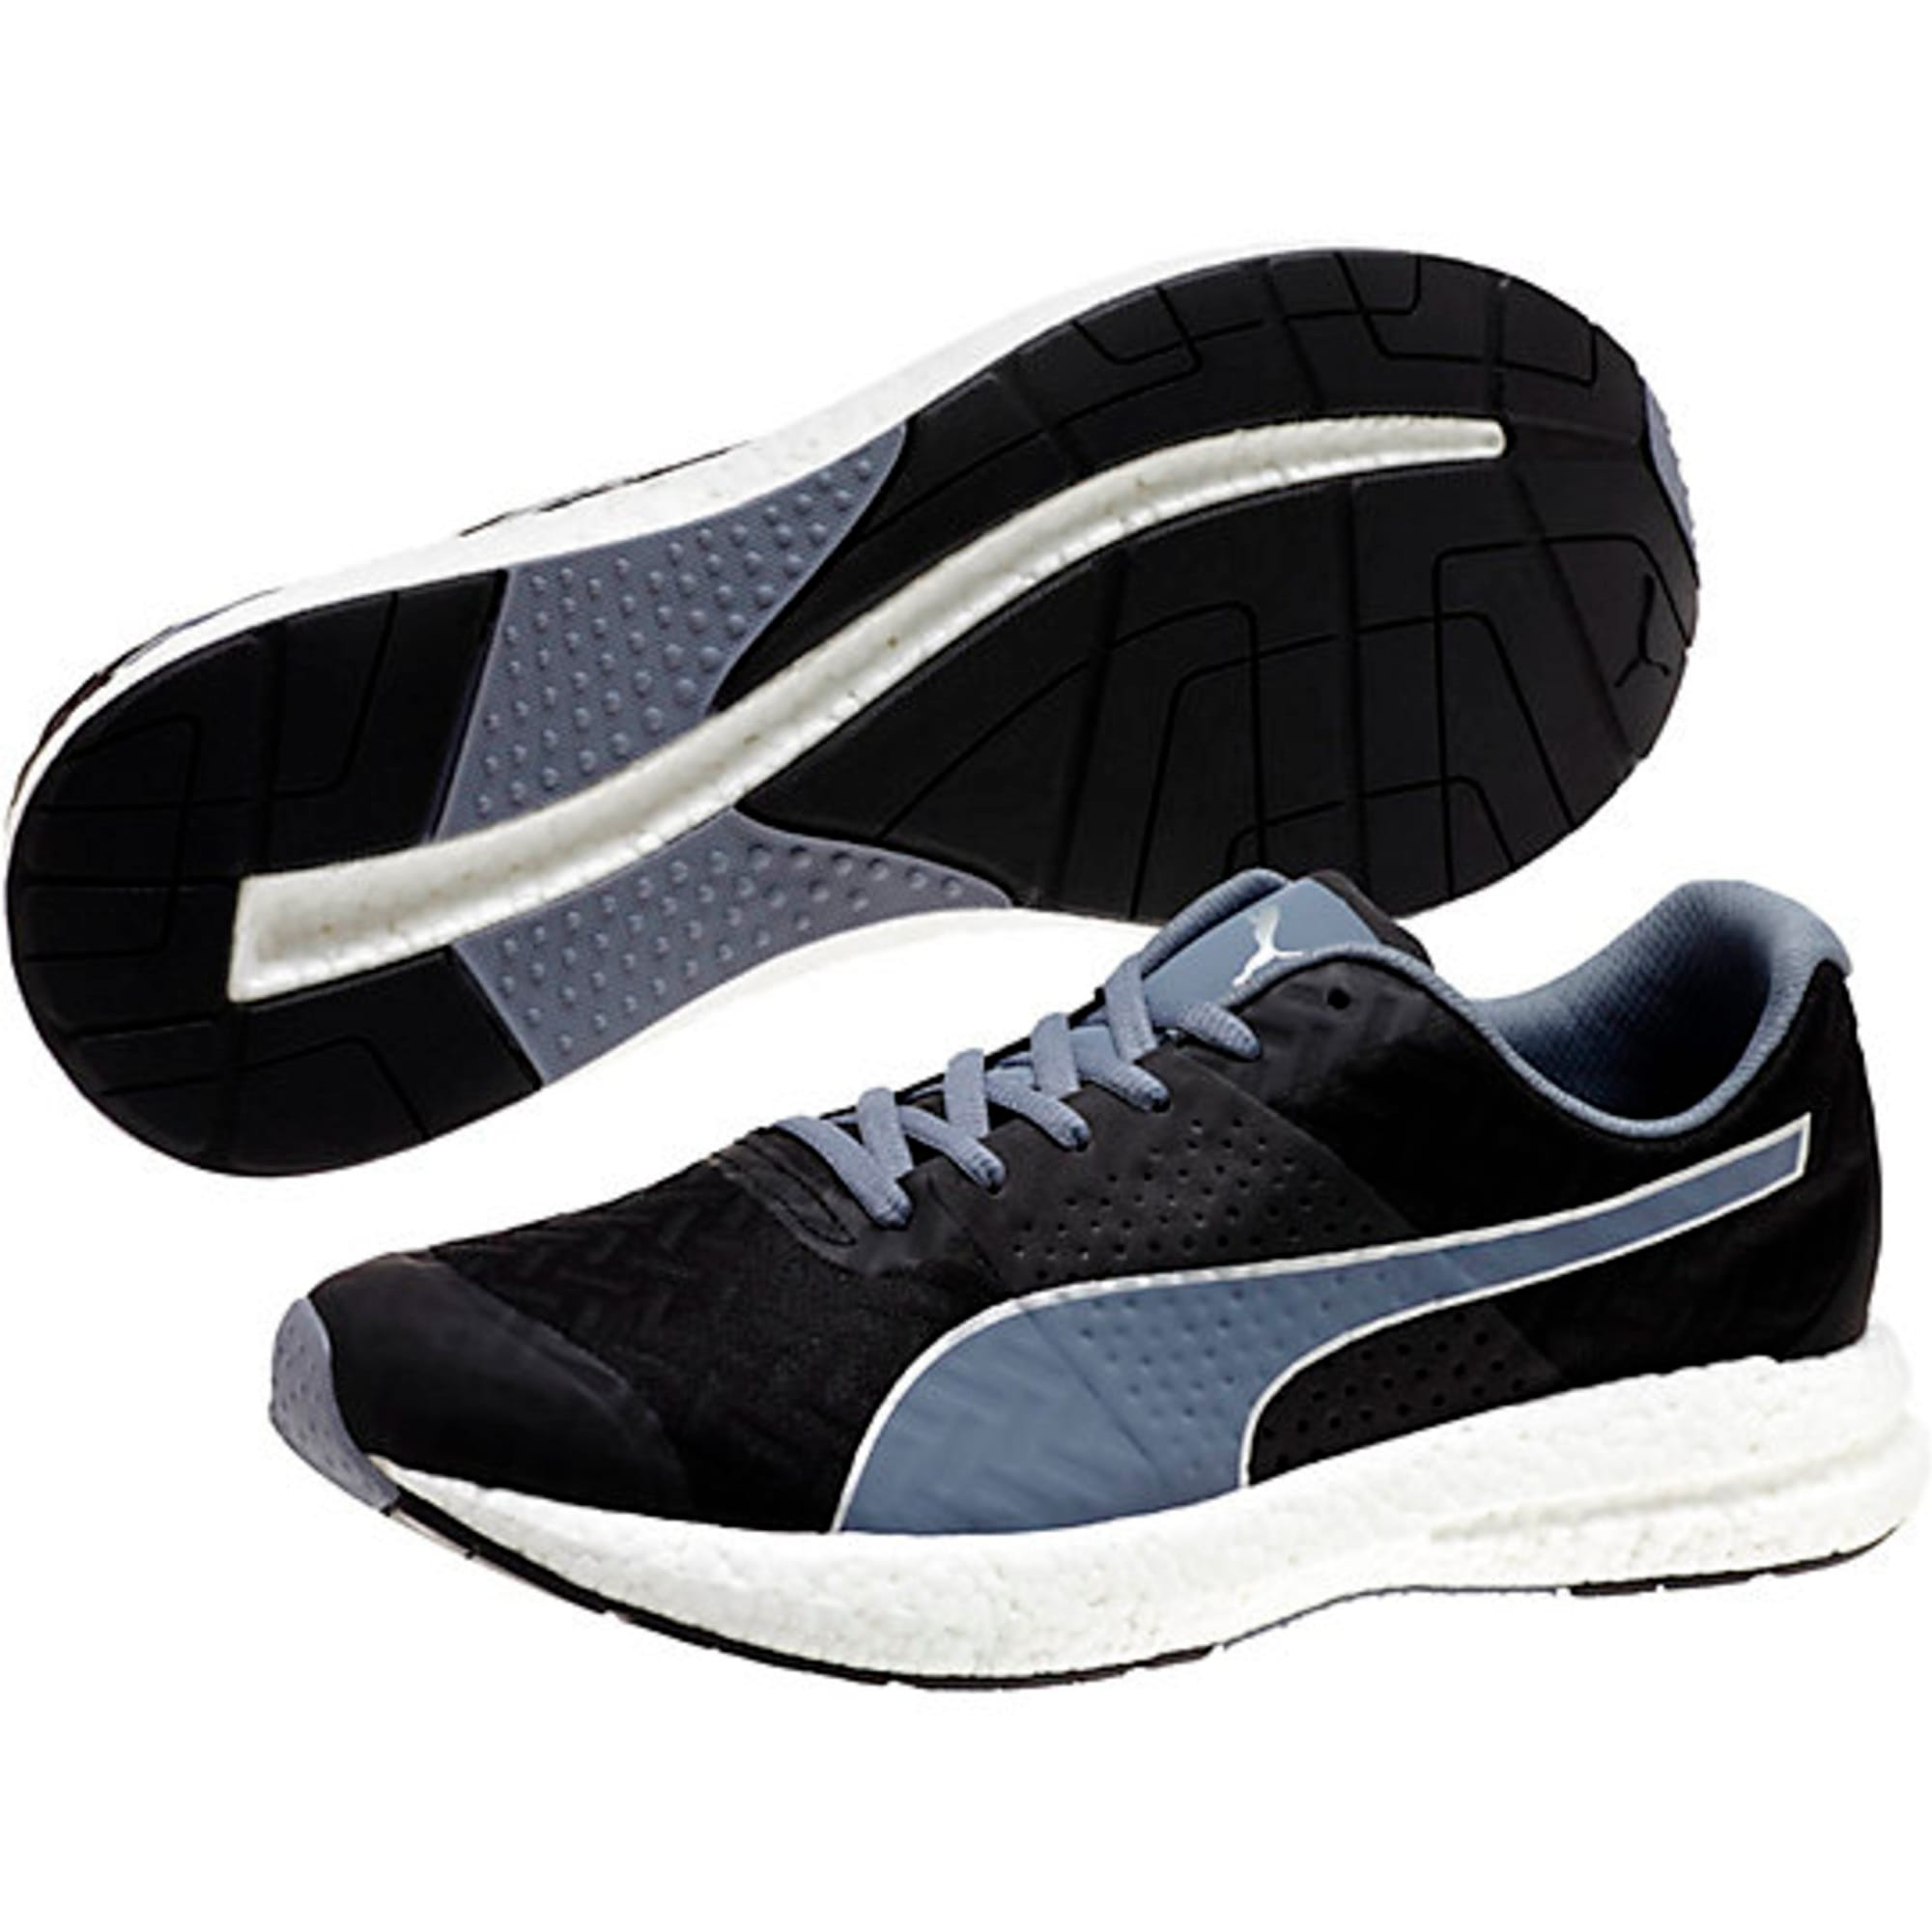 Thumbnail 5 of NRGY Running Shoes, black-folkstone gray, medium-IND